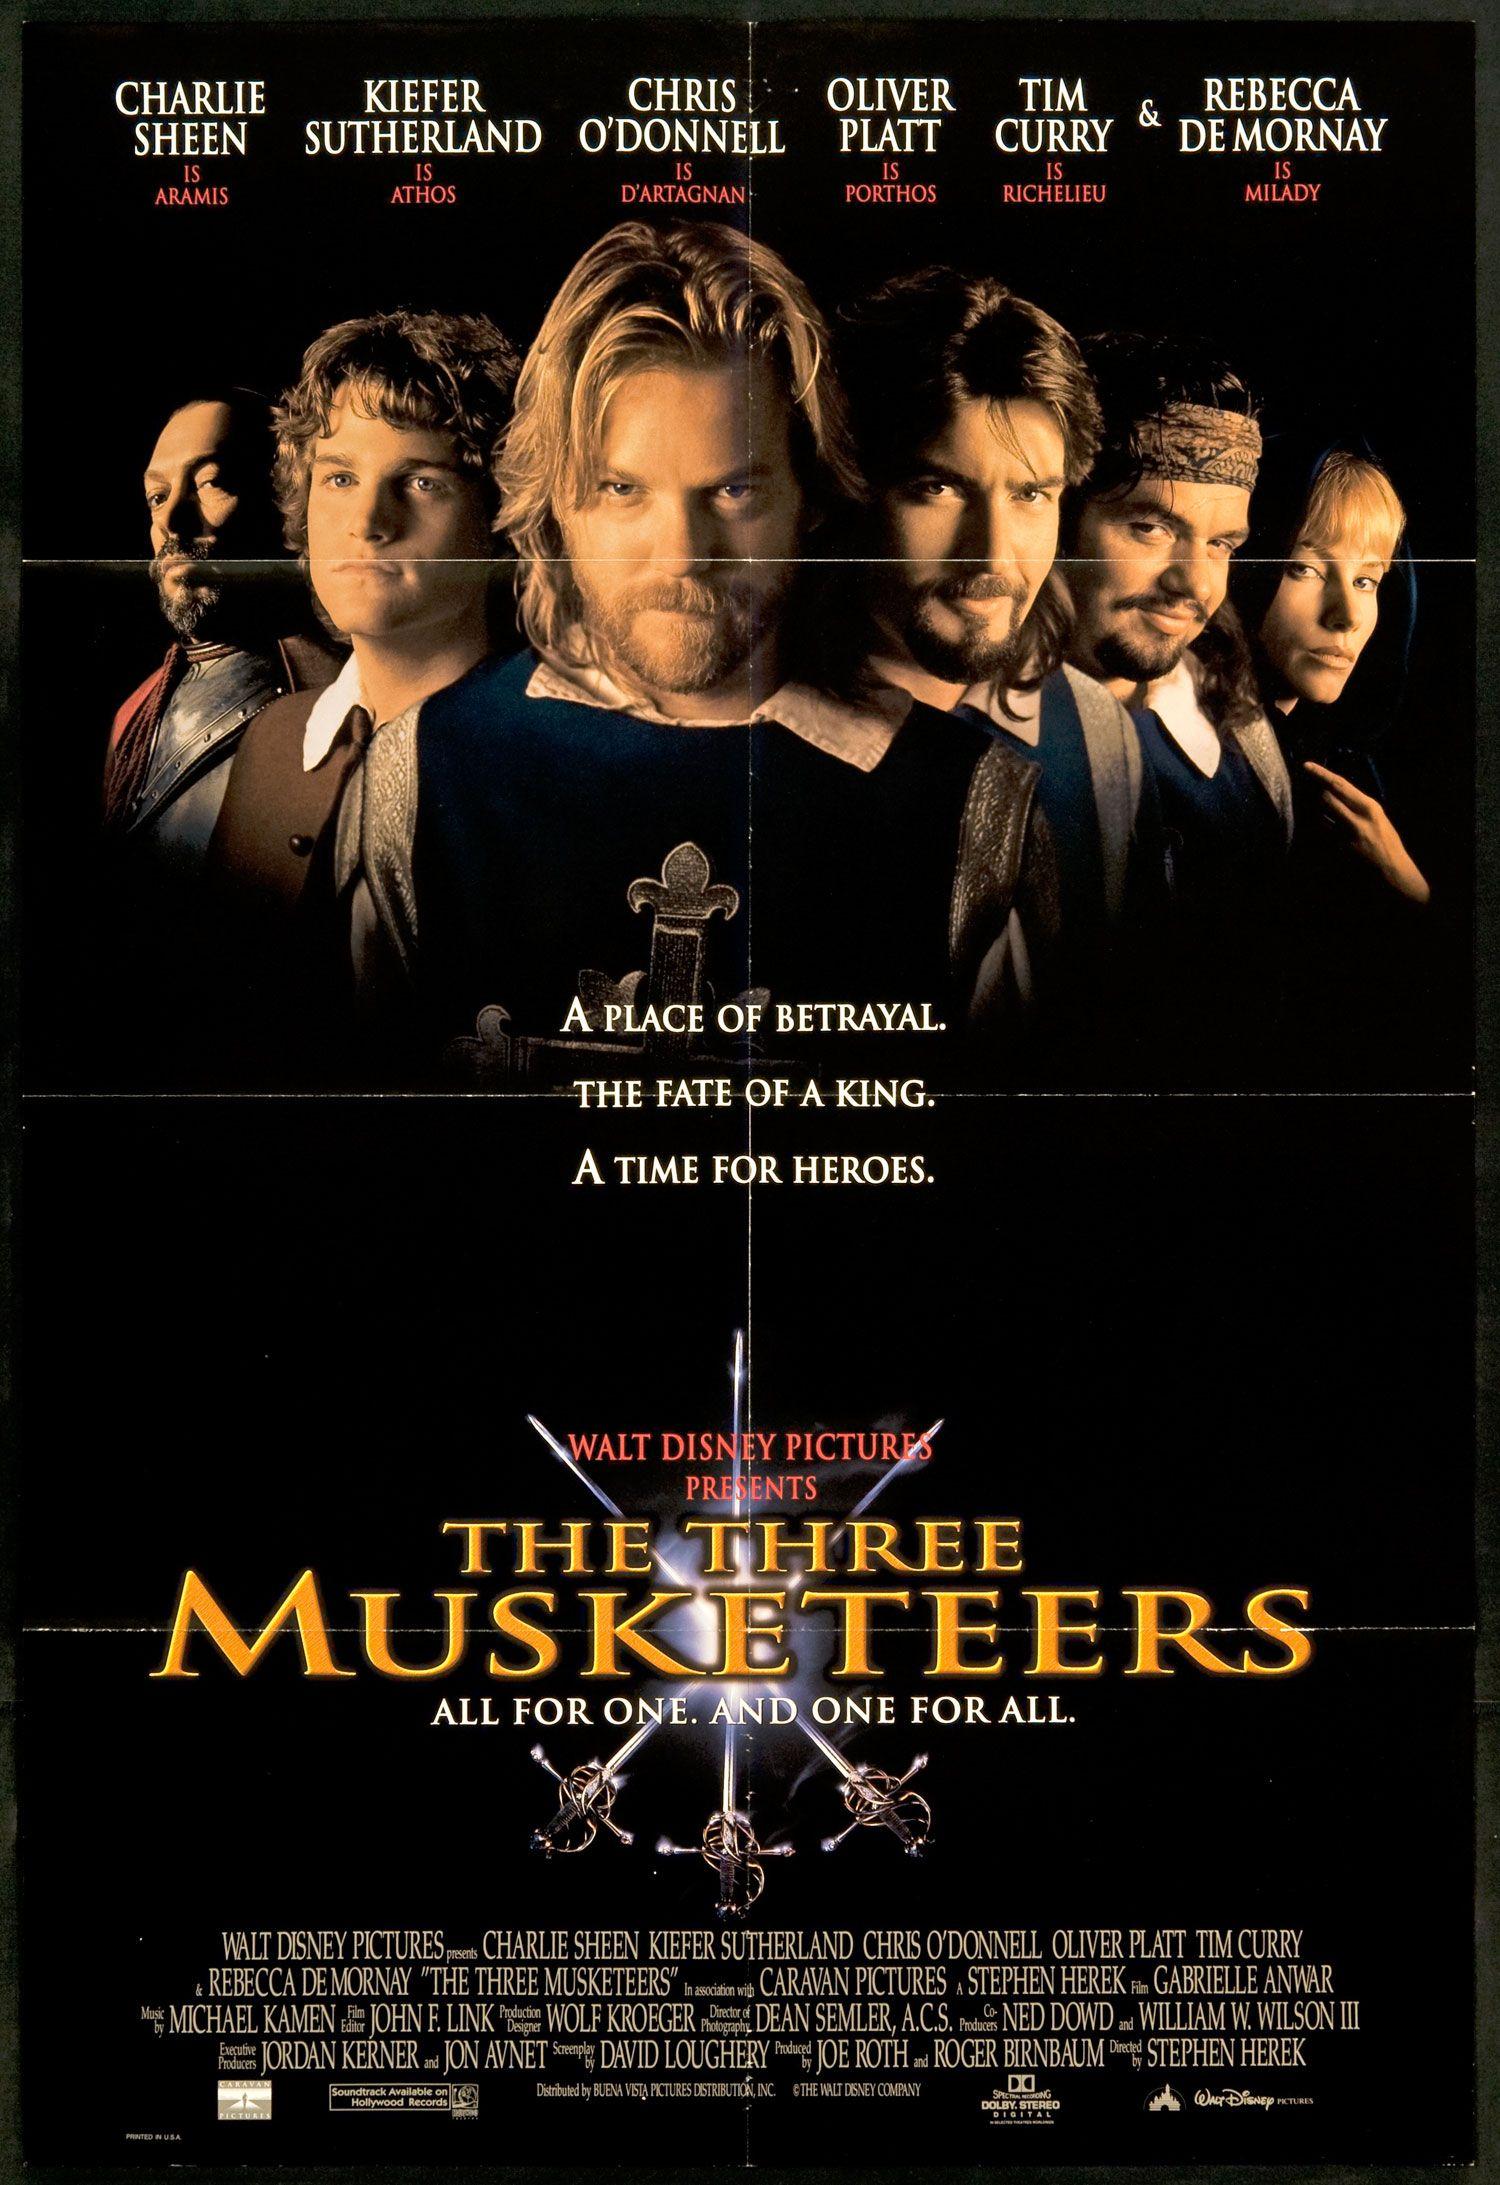 The Three Musketeers 1993 Full Movie Viooz